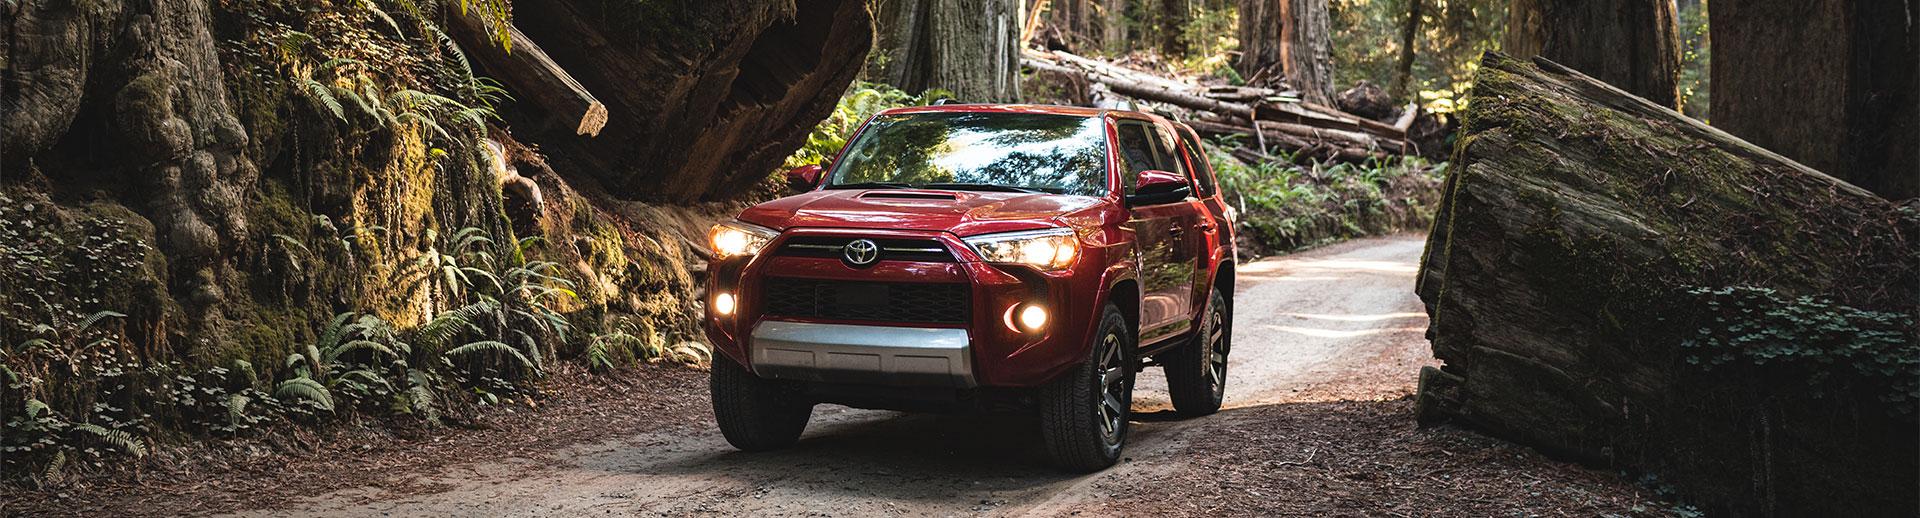 2020 Toyota 4Runner Lifestyle Photo